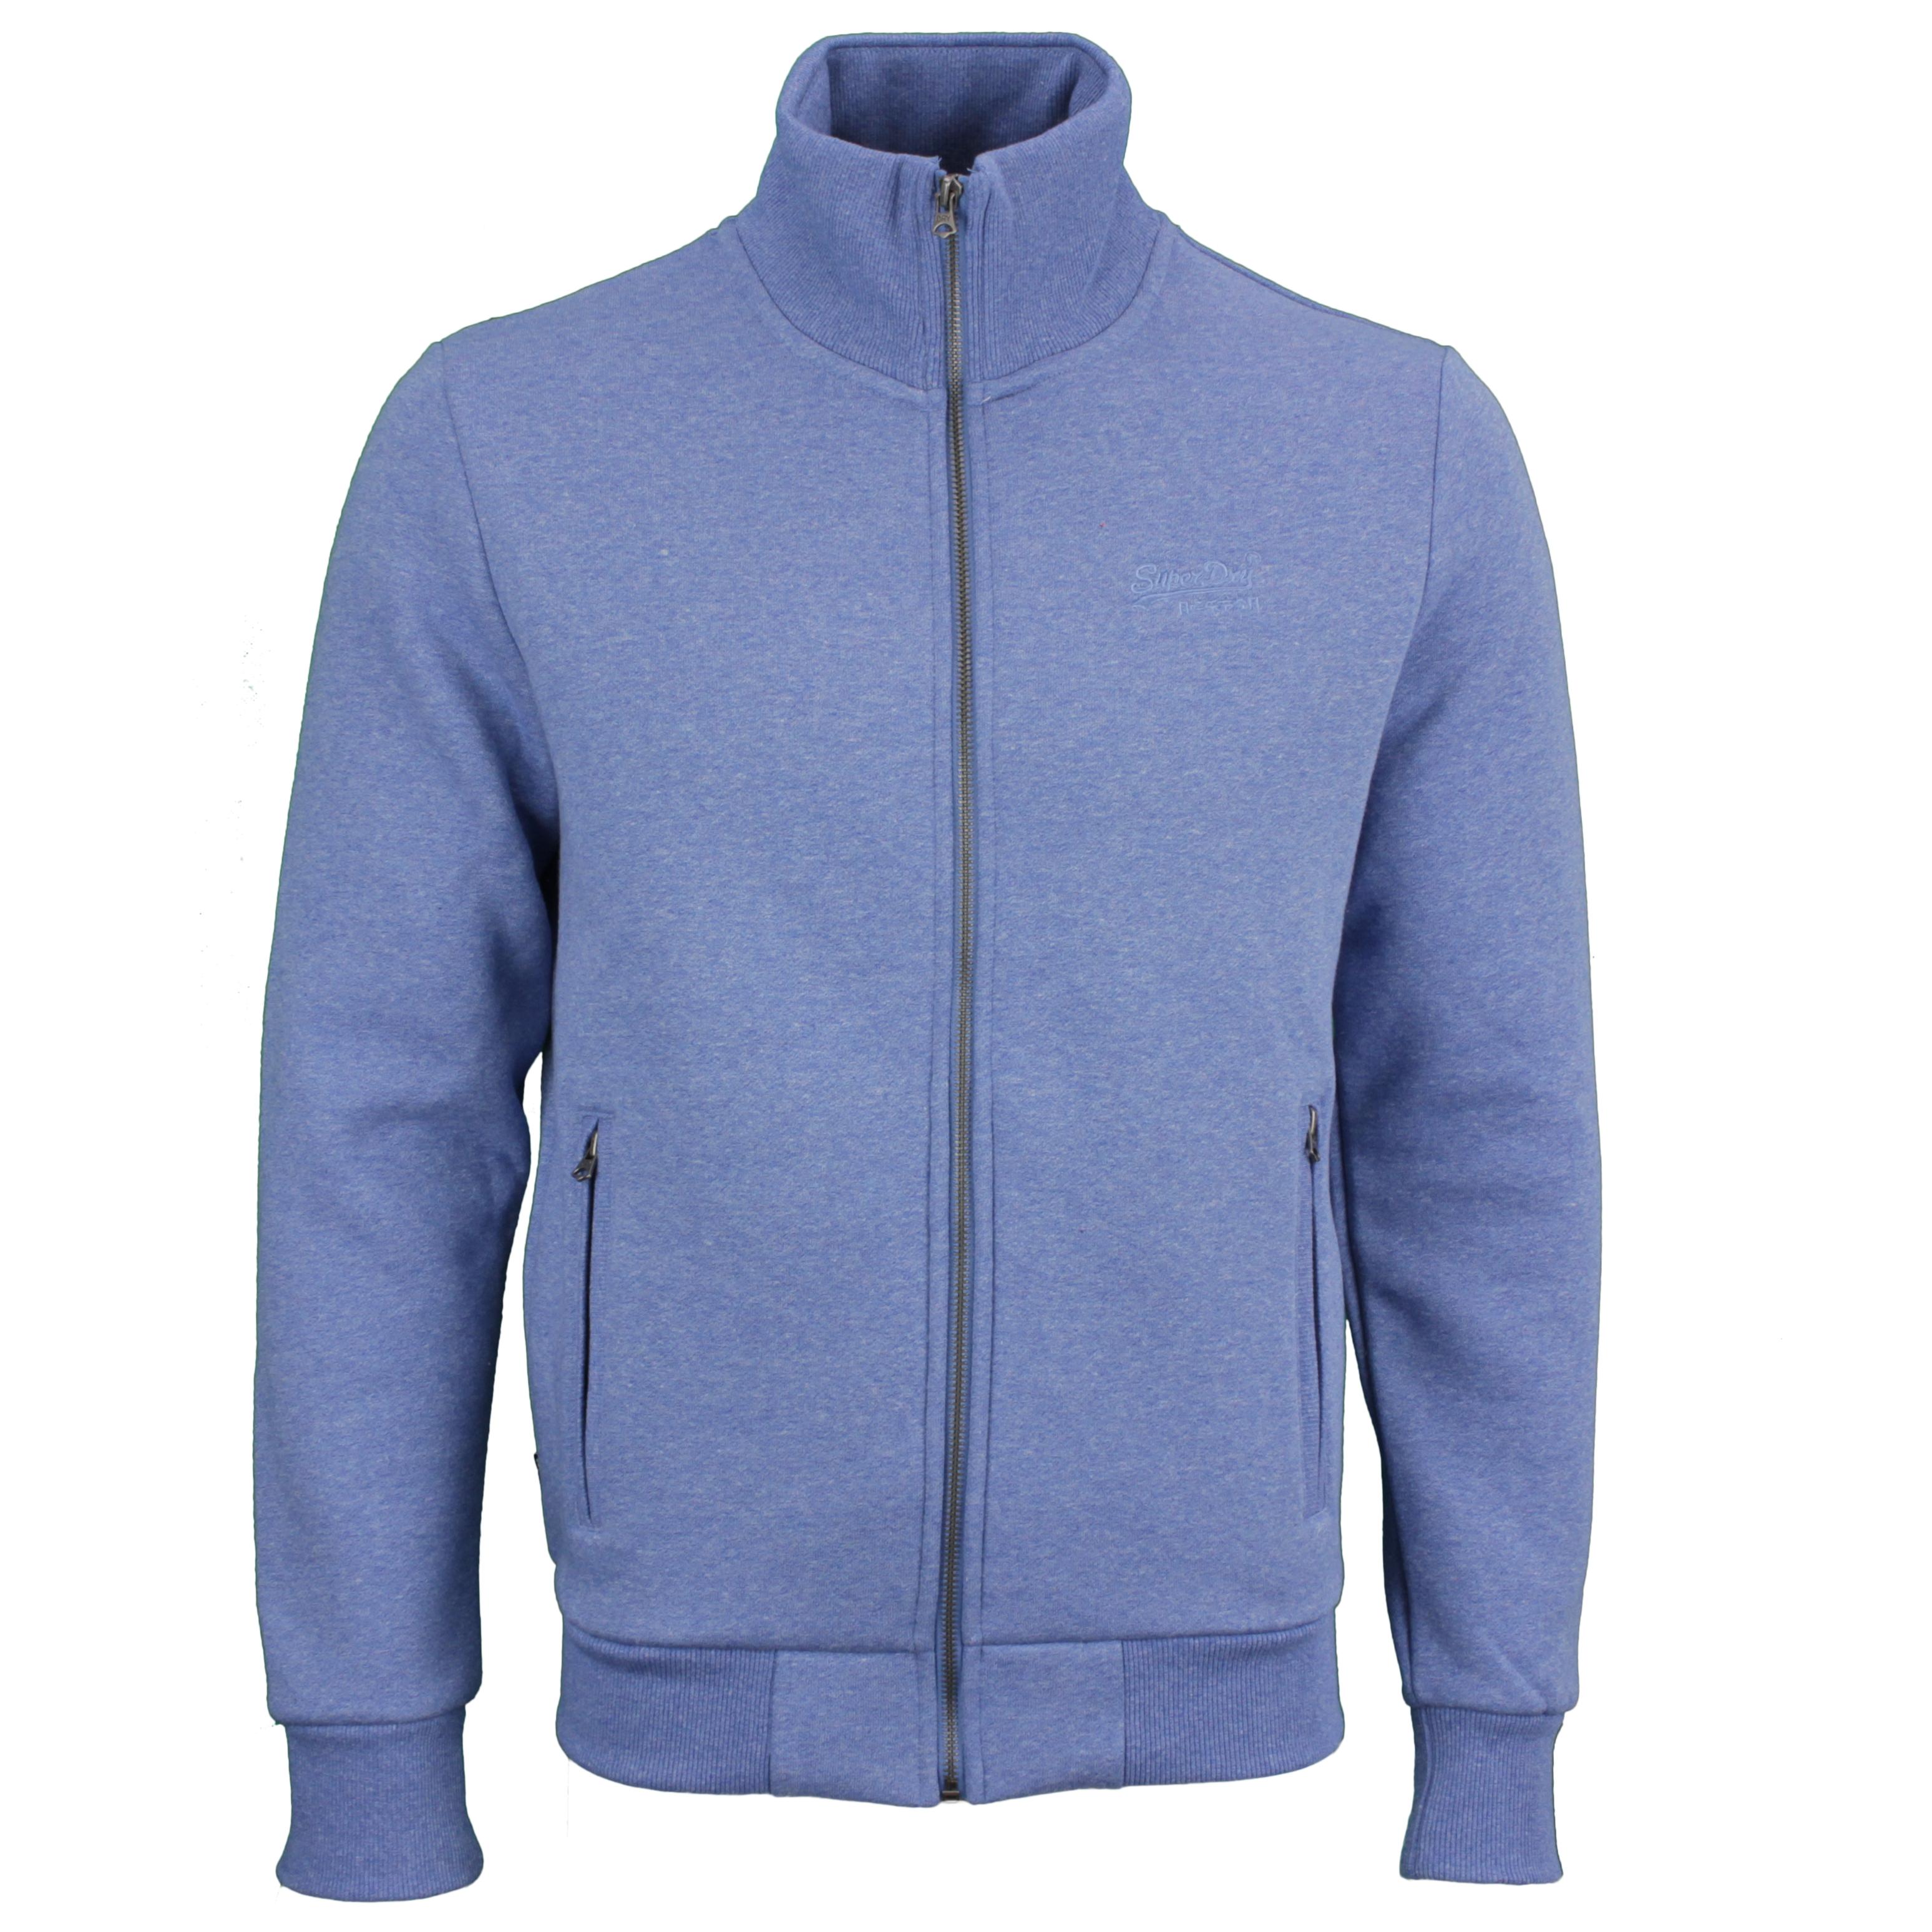 Superdry Sweat Jacke Sweatjacke Weste Ziphood  M2011042A 5ED blue Dark Cobalt Marl